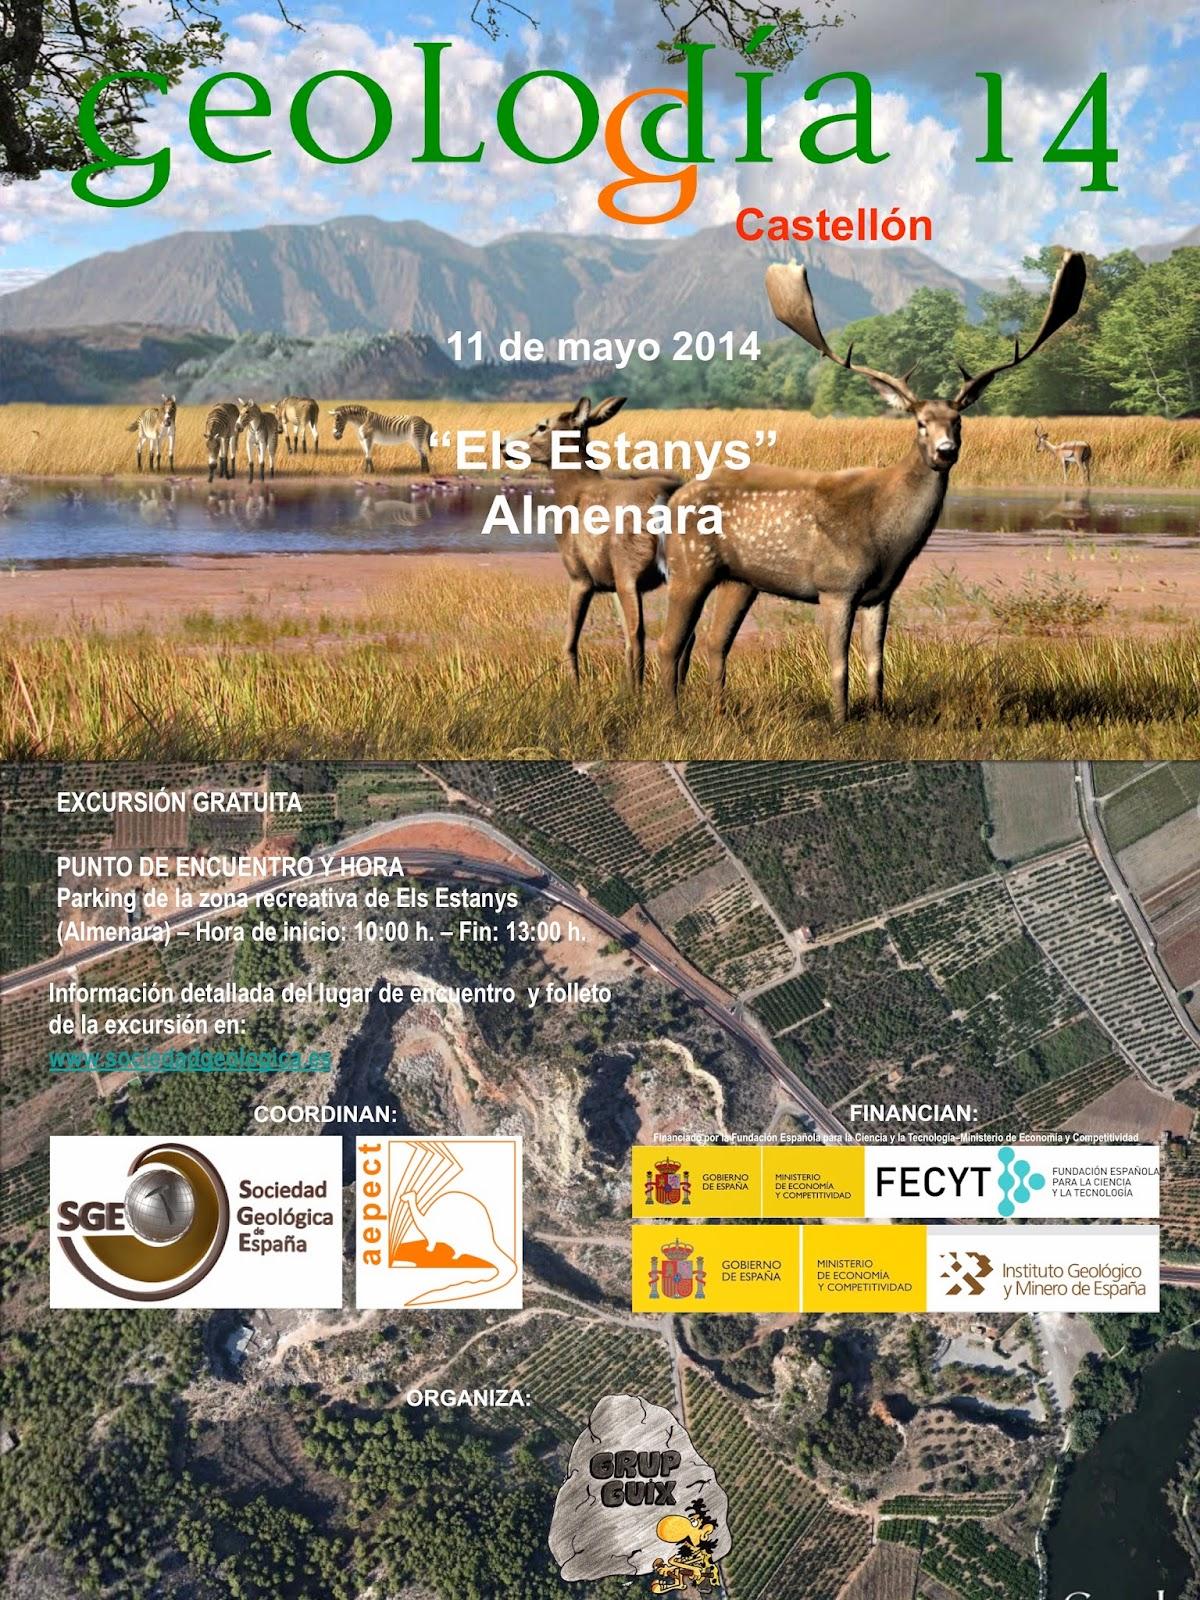 http://ambitcientific.blogspot.com.es/2014/05/geolodia-2014-castellon-grup-guix-vila.html